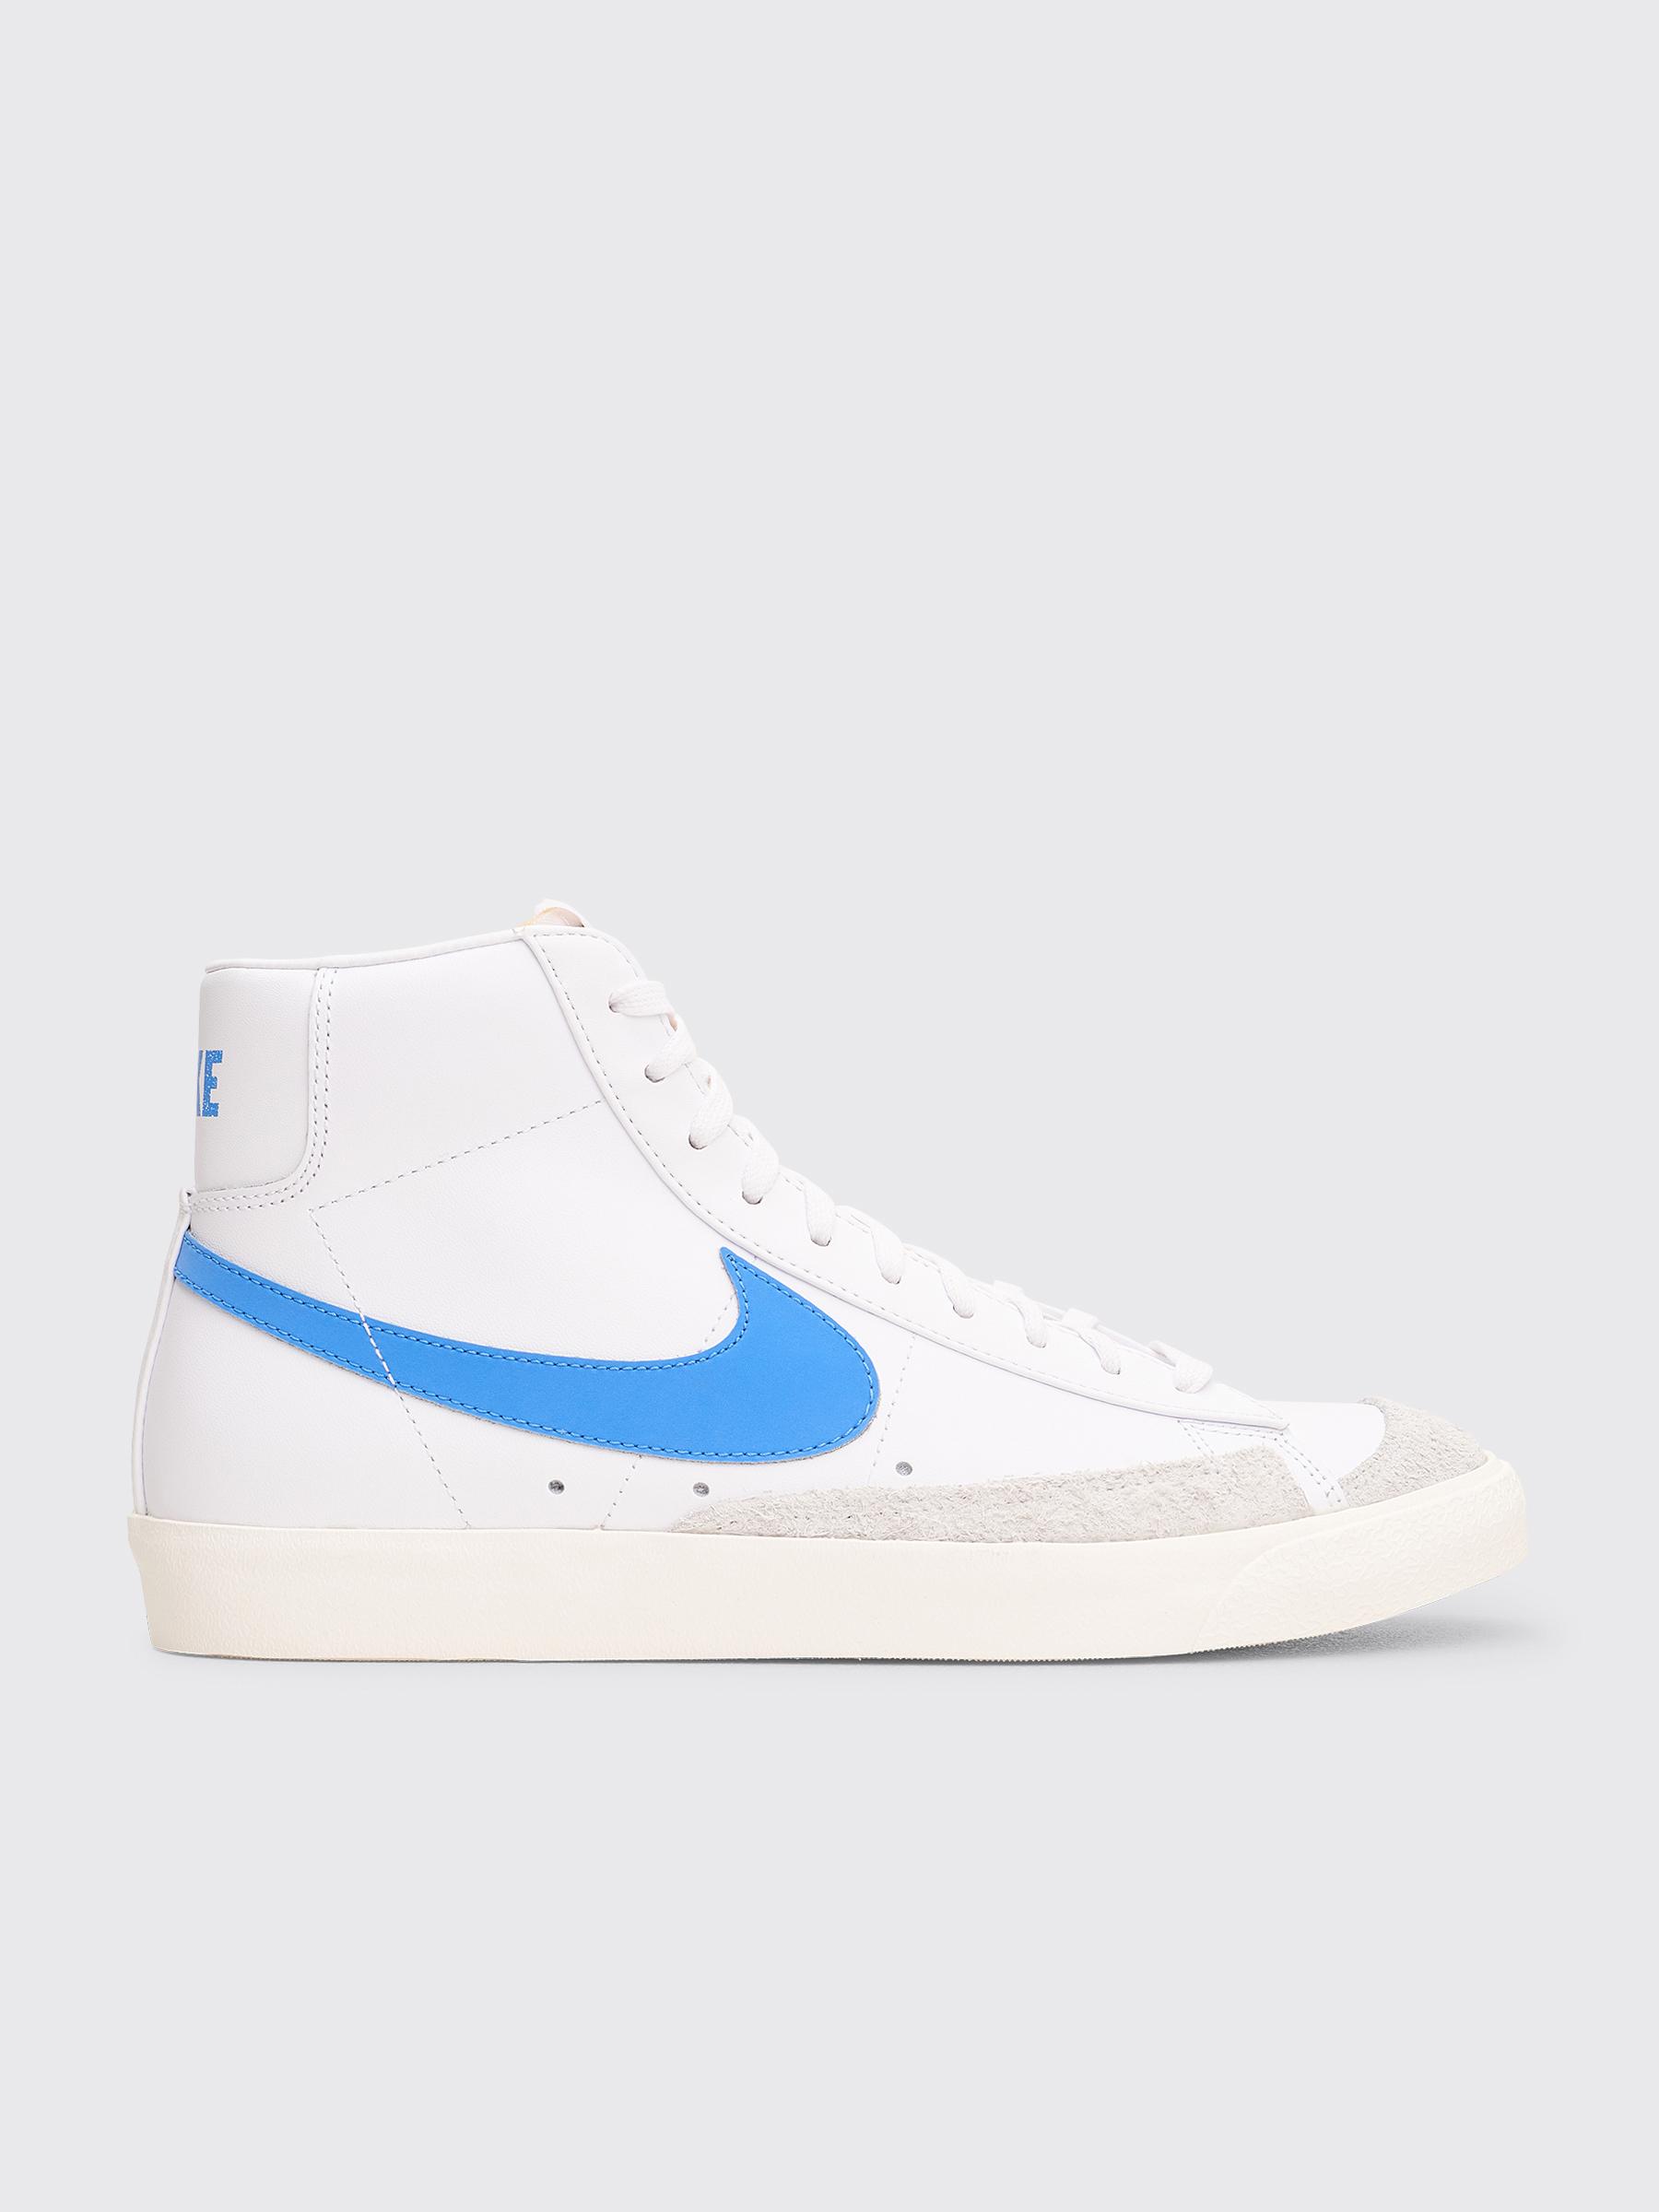 Très Bien - Nike Blazer Mid '77 Vintage Pacific Blue / Sail White